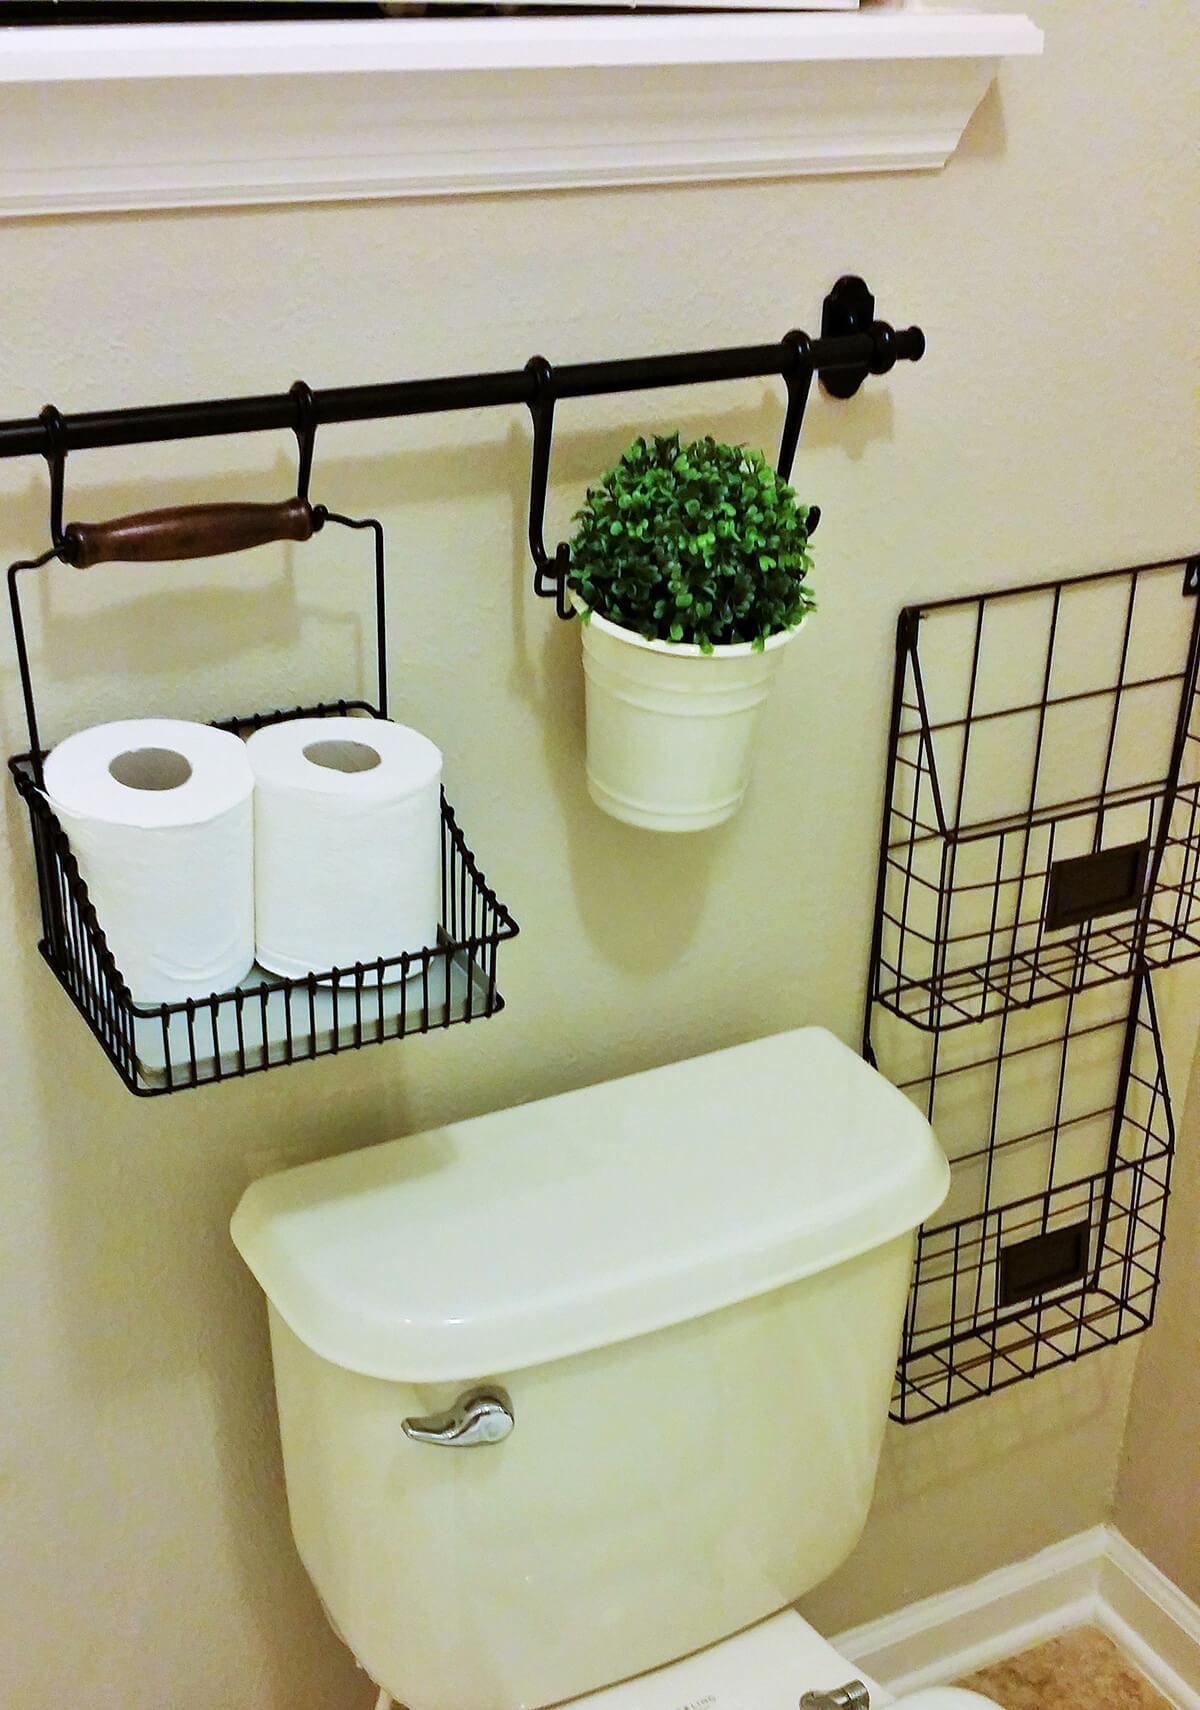 26-hanging-bathroom-storage-ideas-homebnc